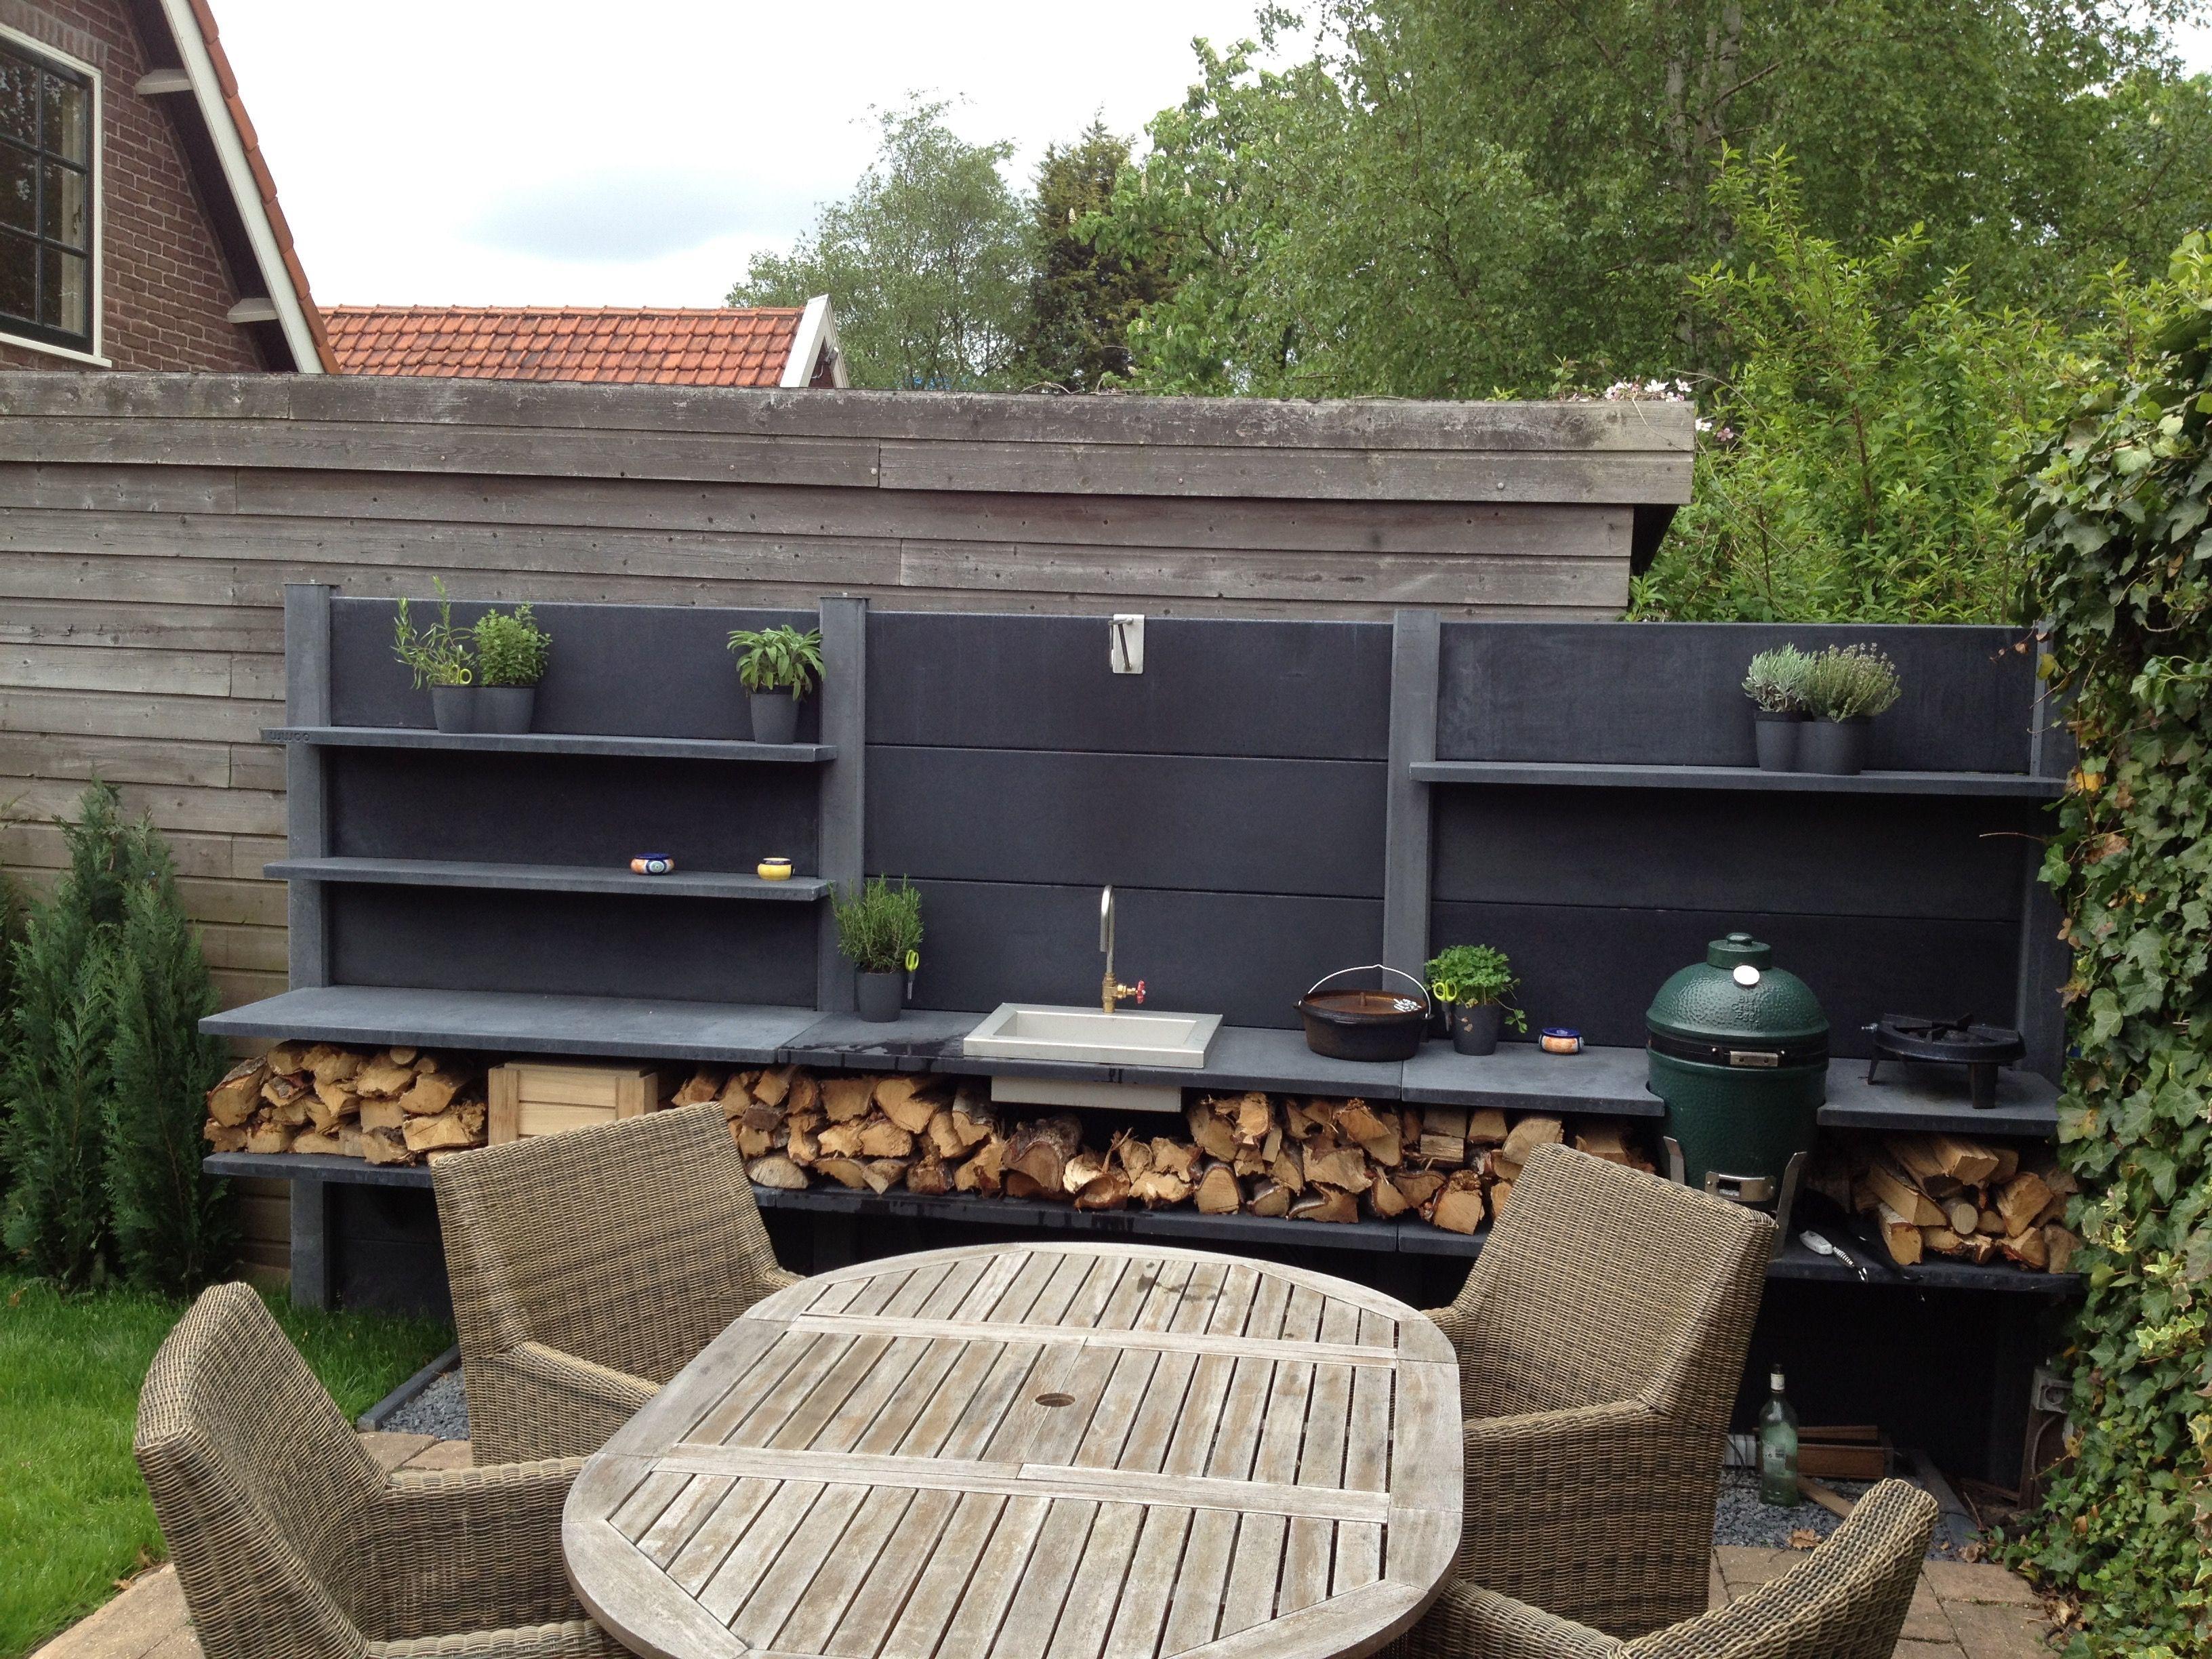 Gartenmetall Outdoor Küche : Outdoor küche gartenhaus: outdoor küche genehmigung gartenhaus m